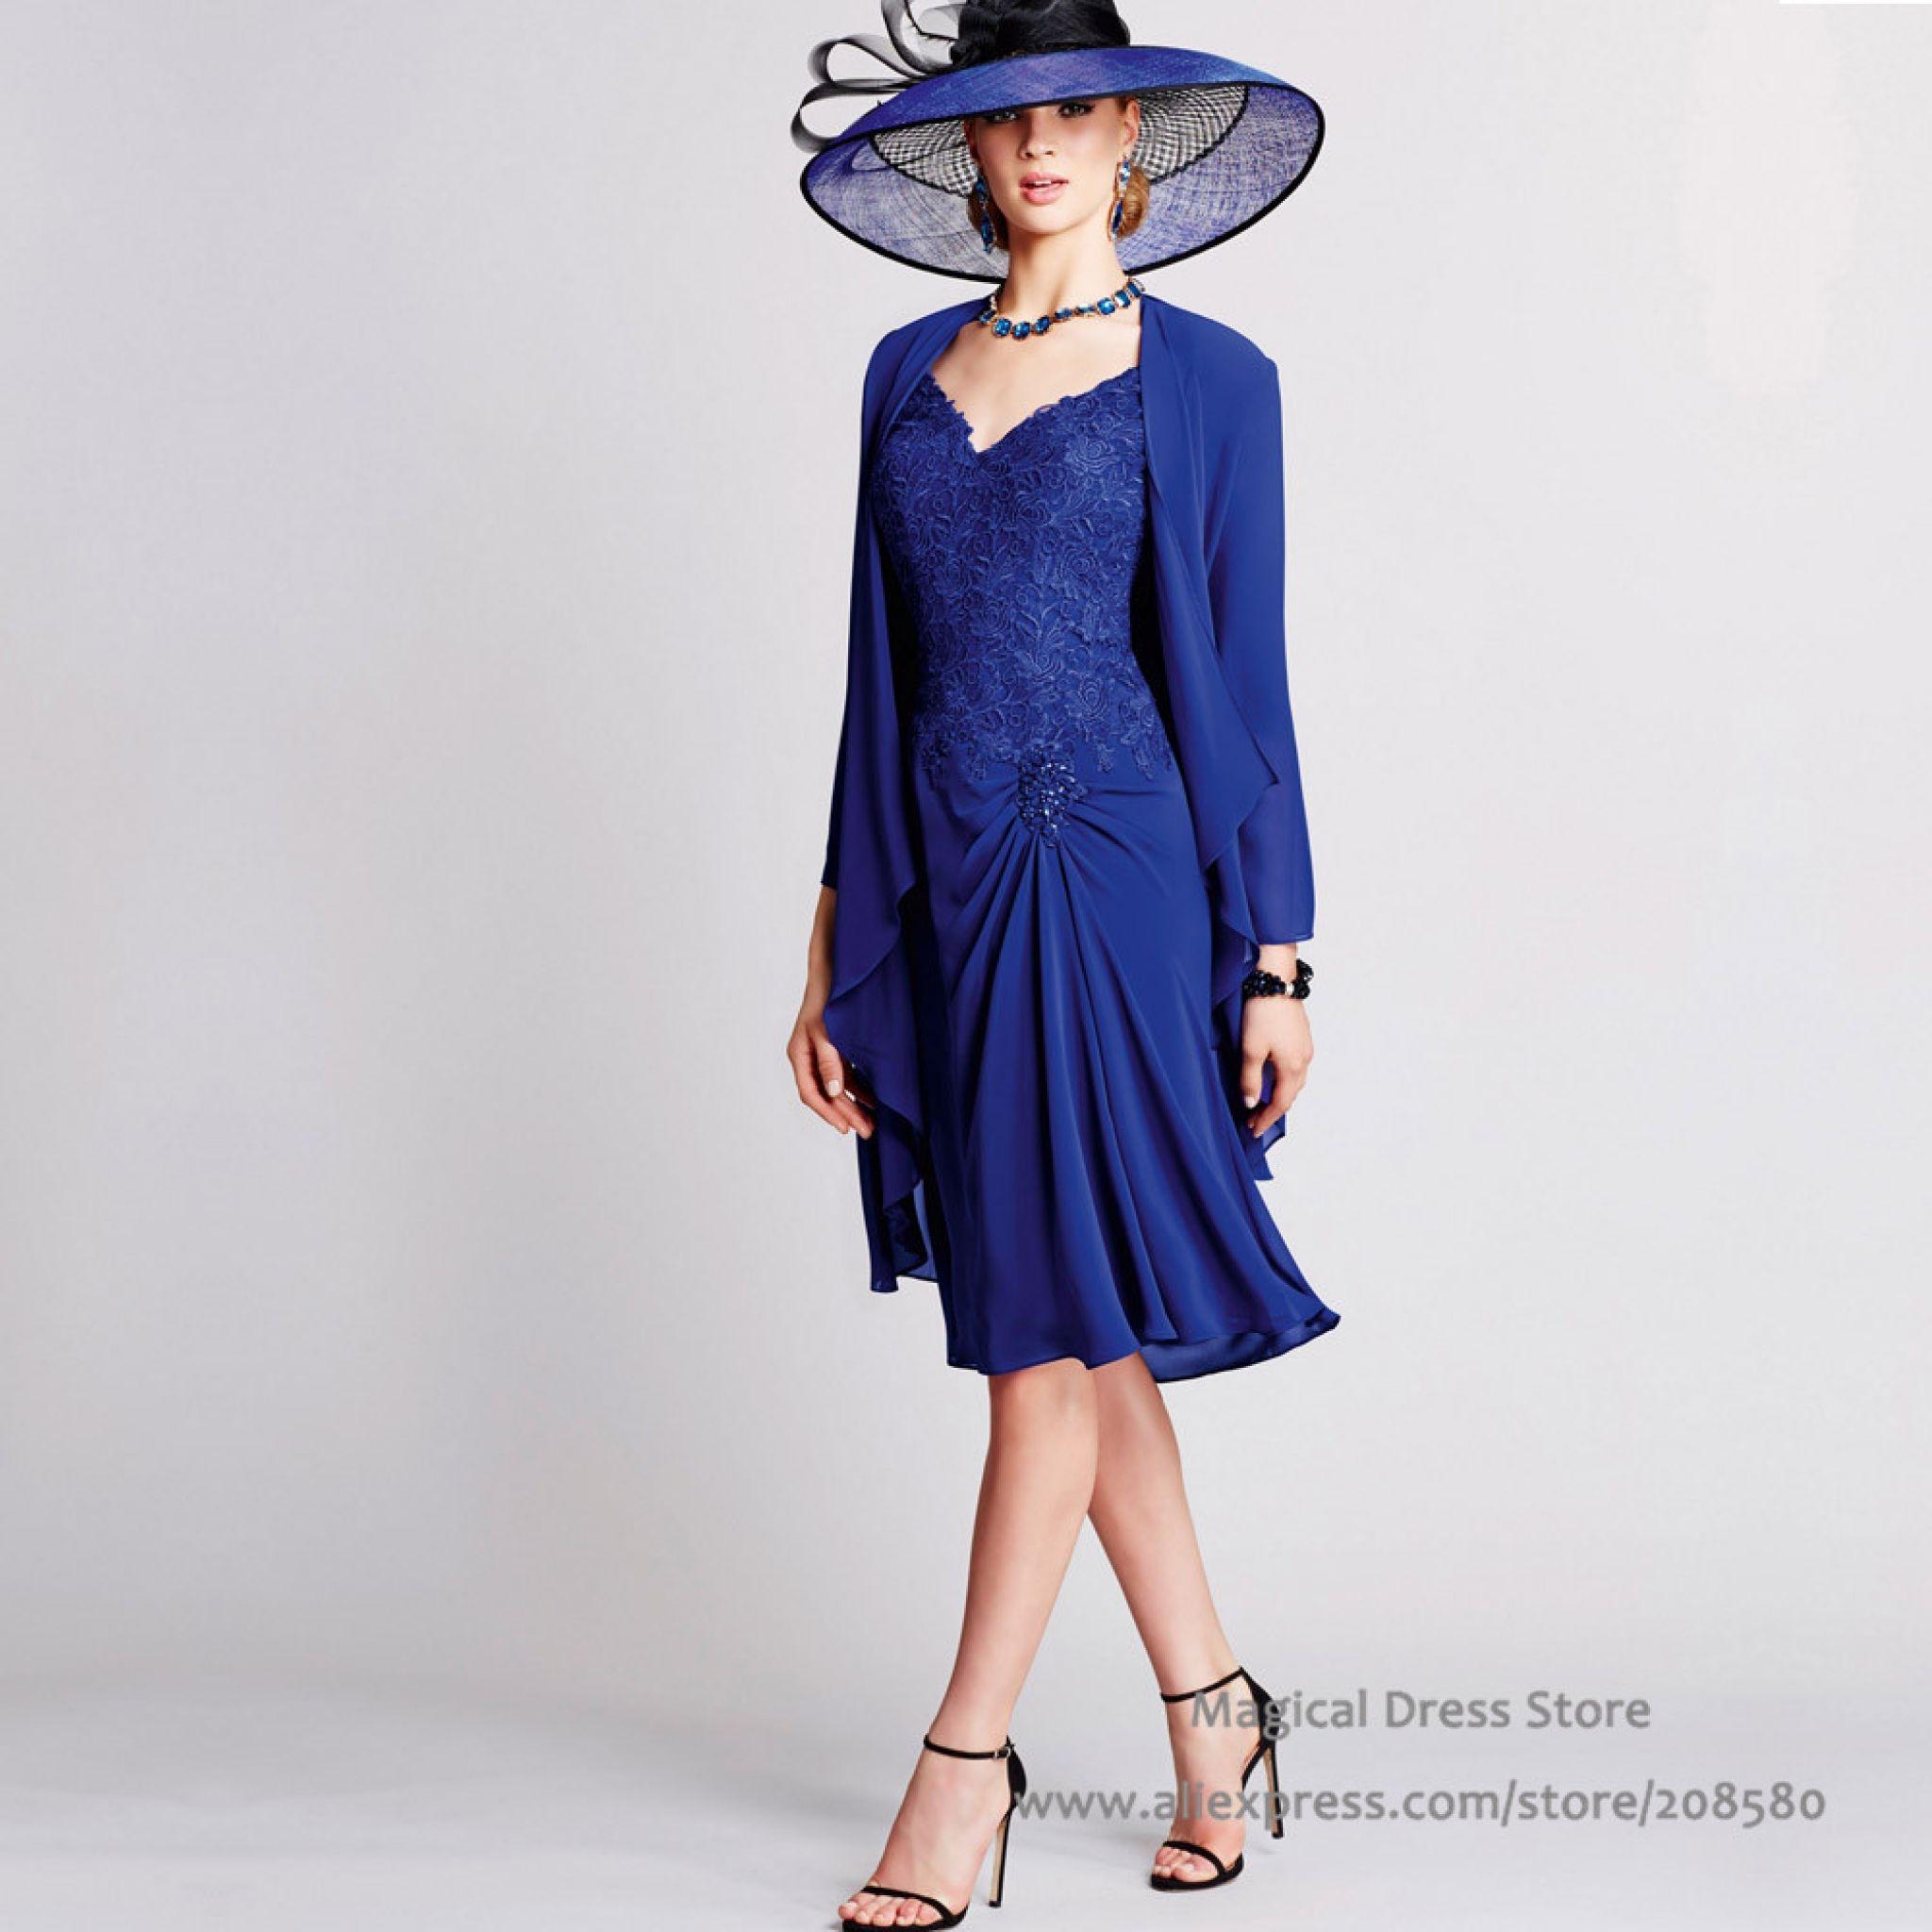 Best dress for wedding guest  buy wedding guest dress  best dresses for wedding Check more at